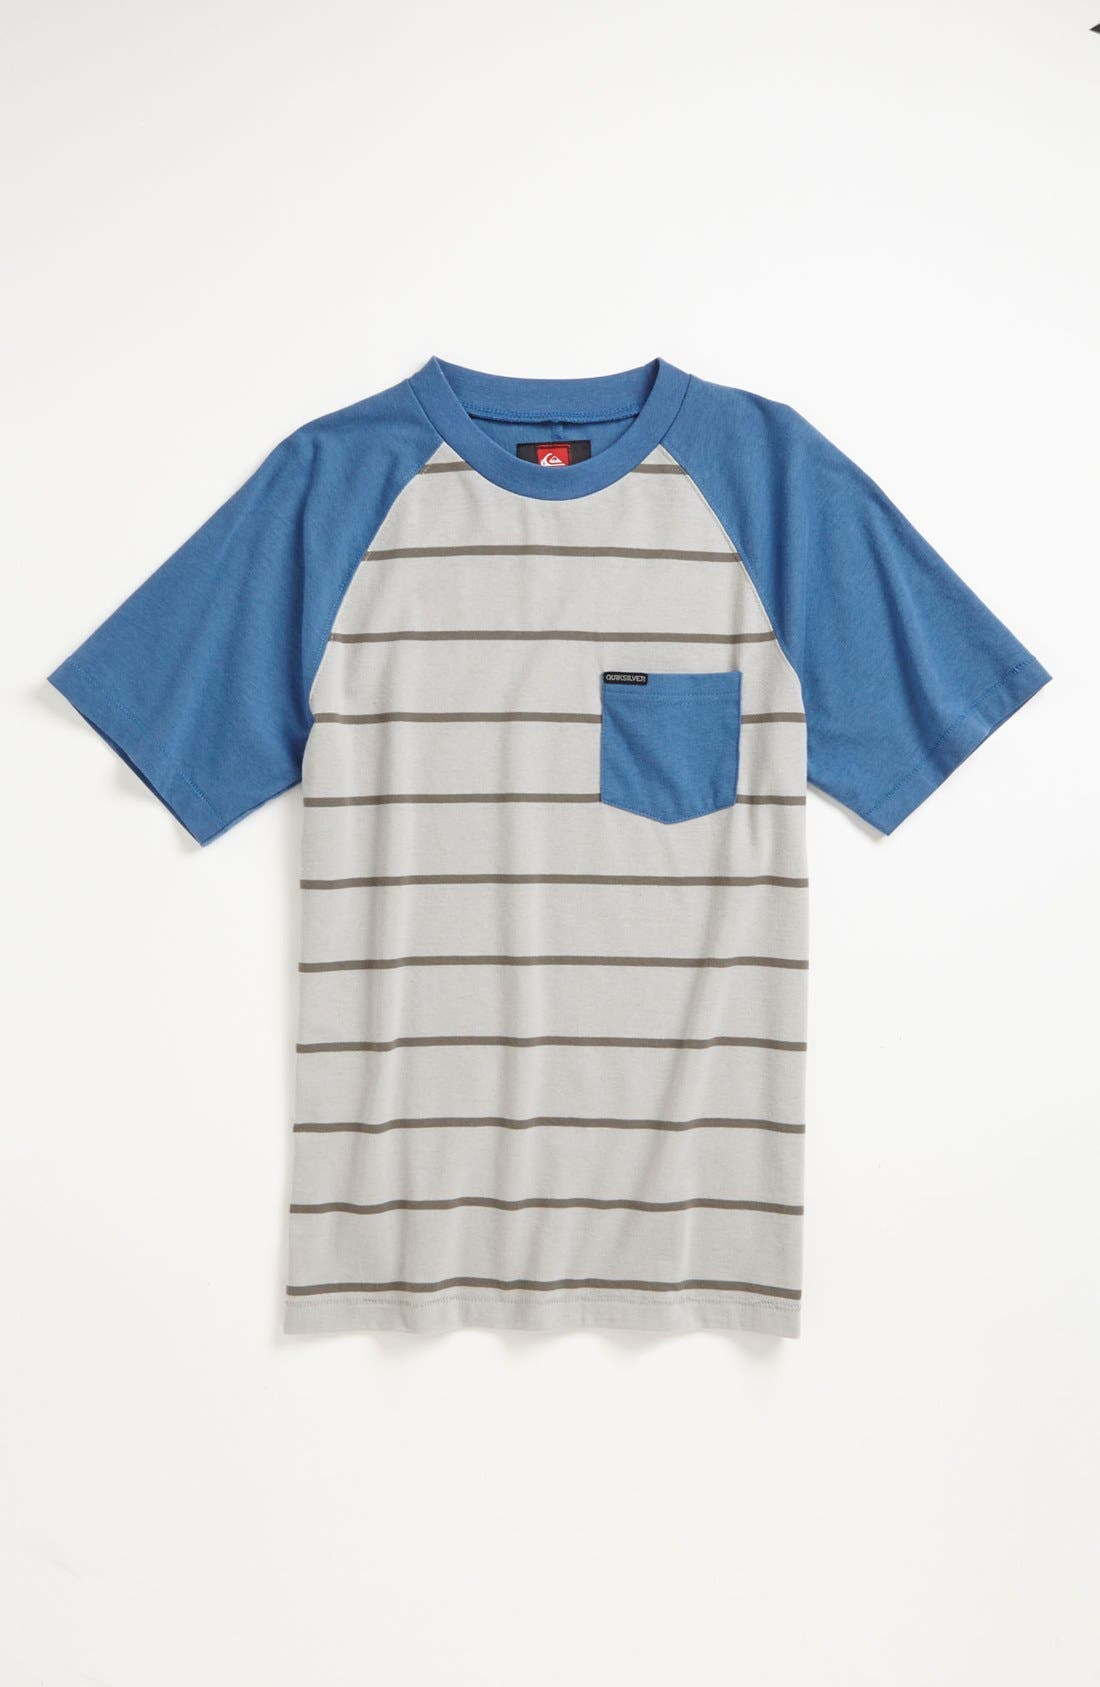 Main Image - Quiksilver 'Lennox' T-Shirt (Big Boys)